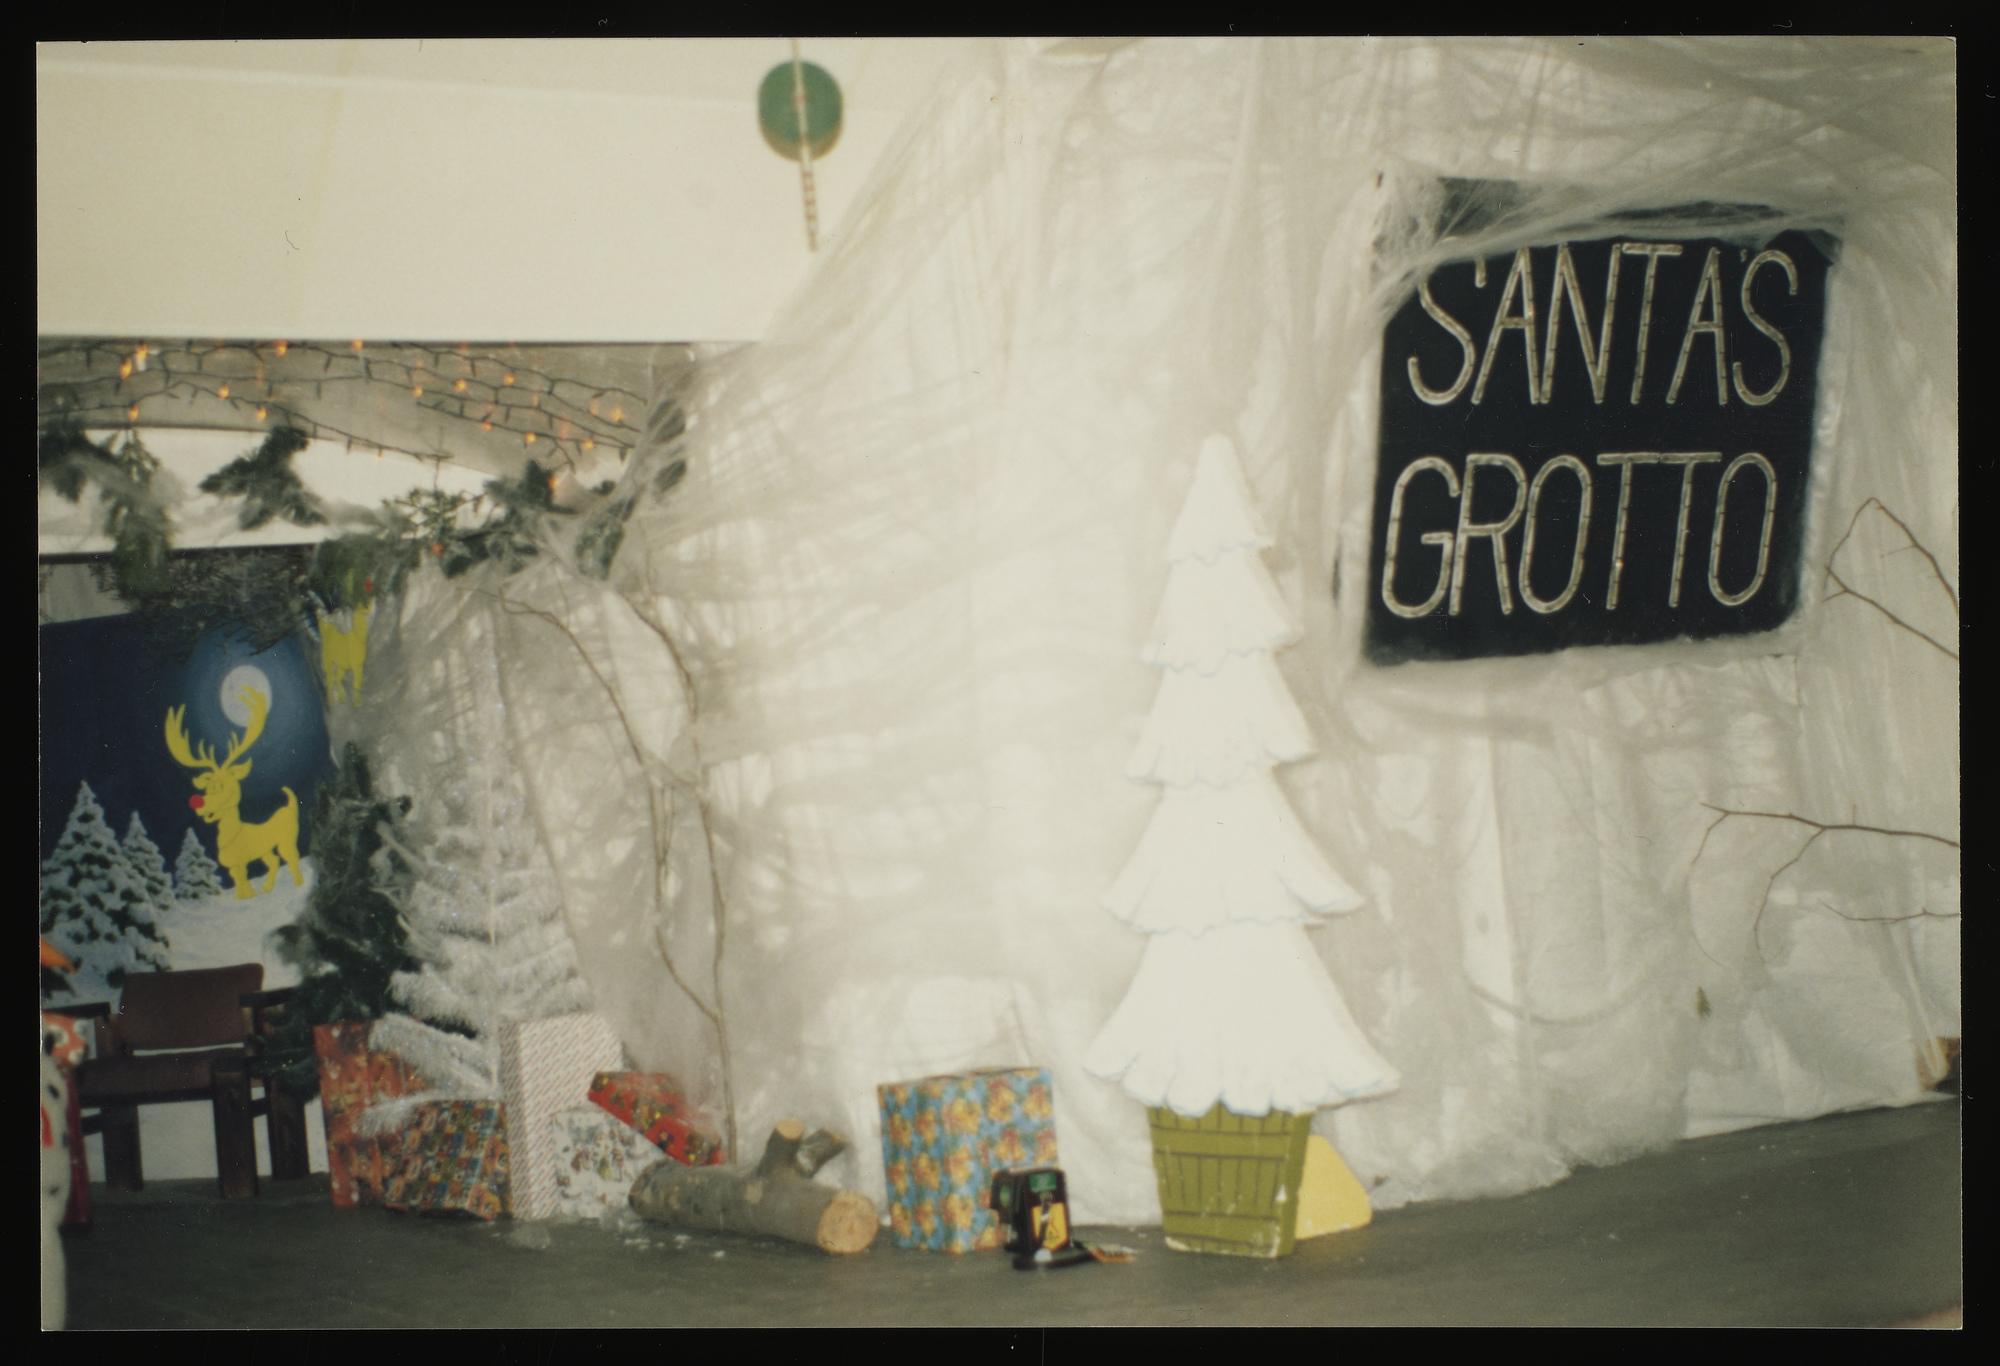 Santa's Grotto in Mount Pleasant, 1991-1992 ©Martin Longhurst's private collection